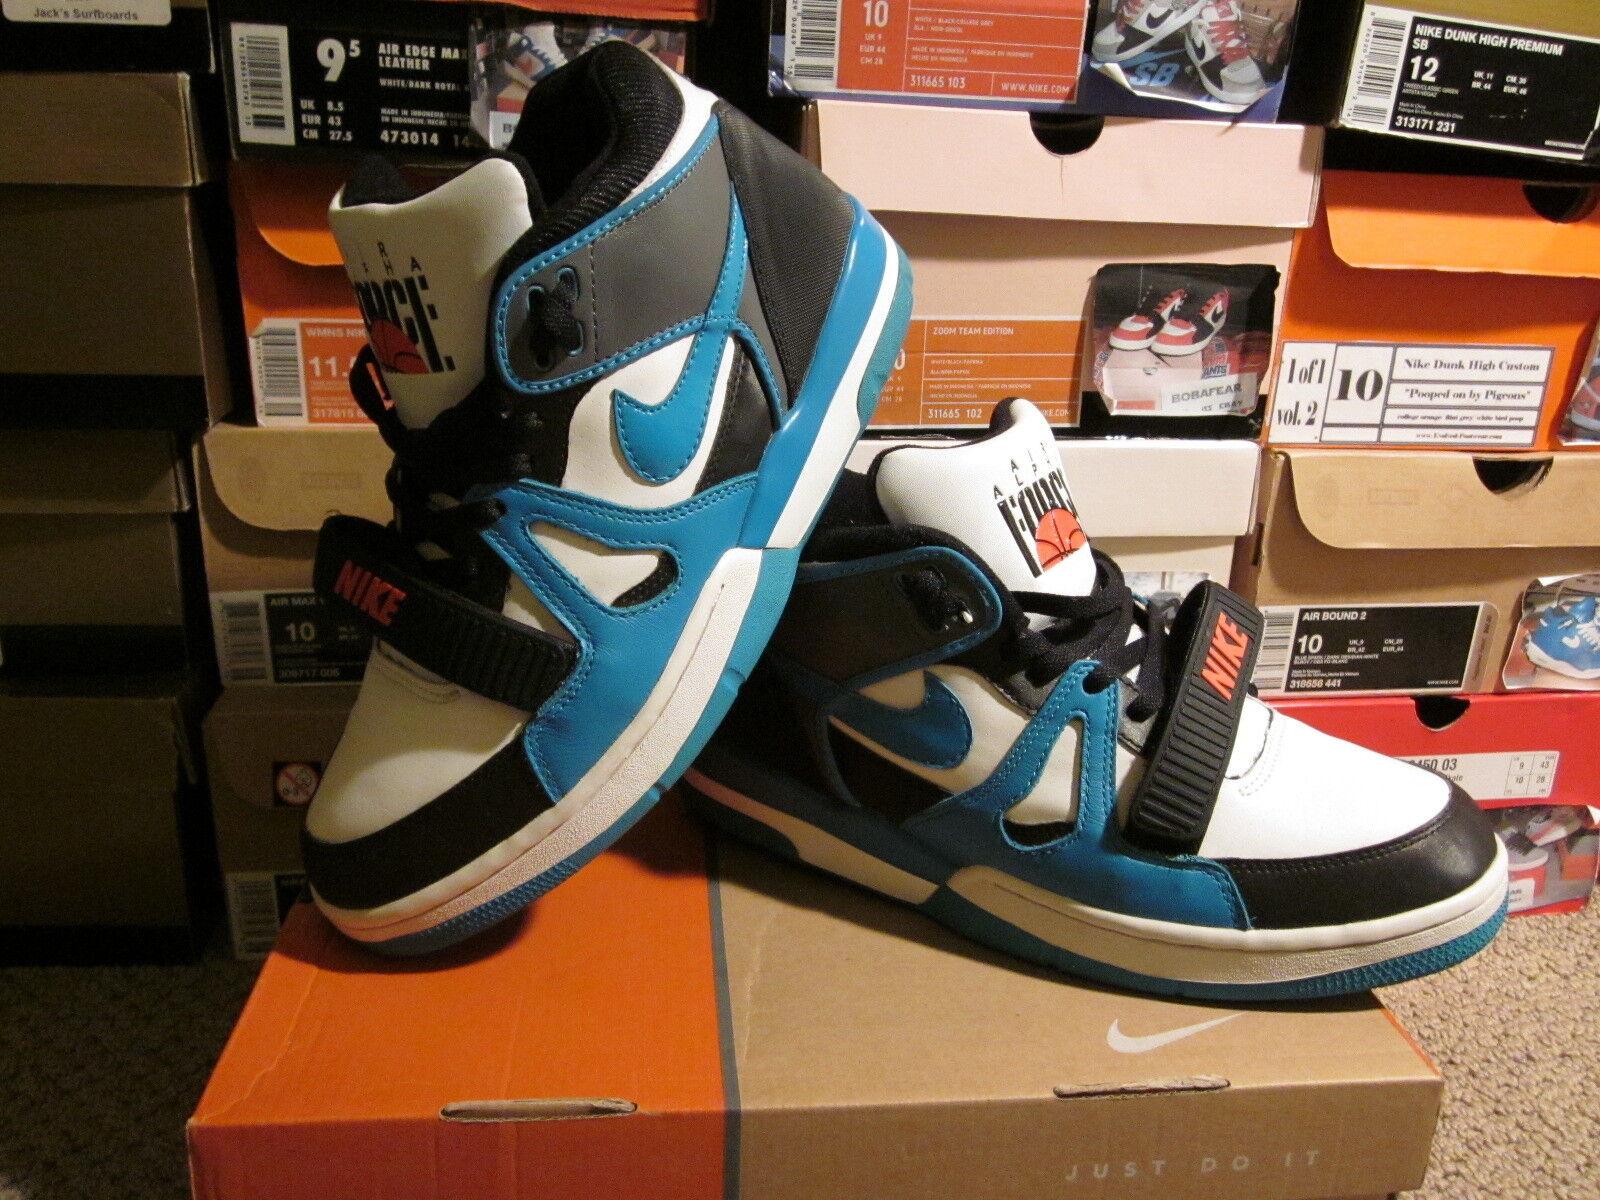 Nike forza alpha 2 mita 2004 asia esclusiva ii 3m giappone taglia 10 basket